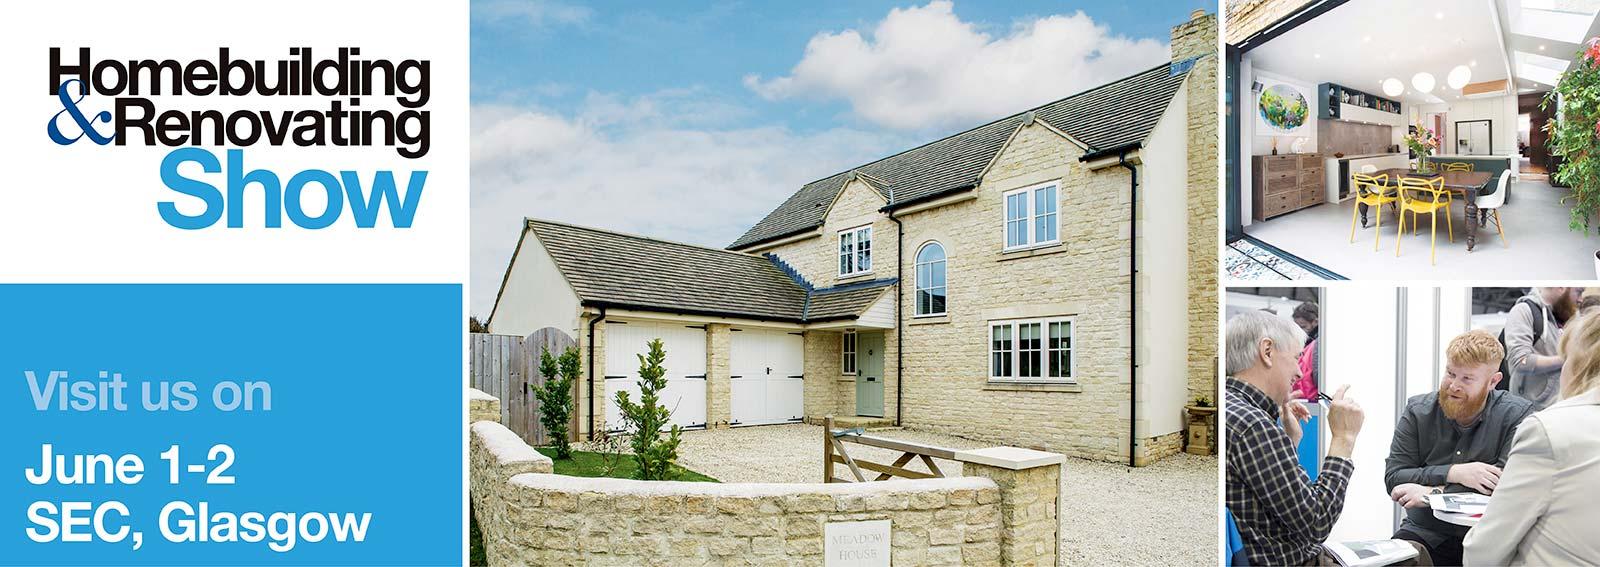 homebuilding-1600x567.jpg